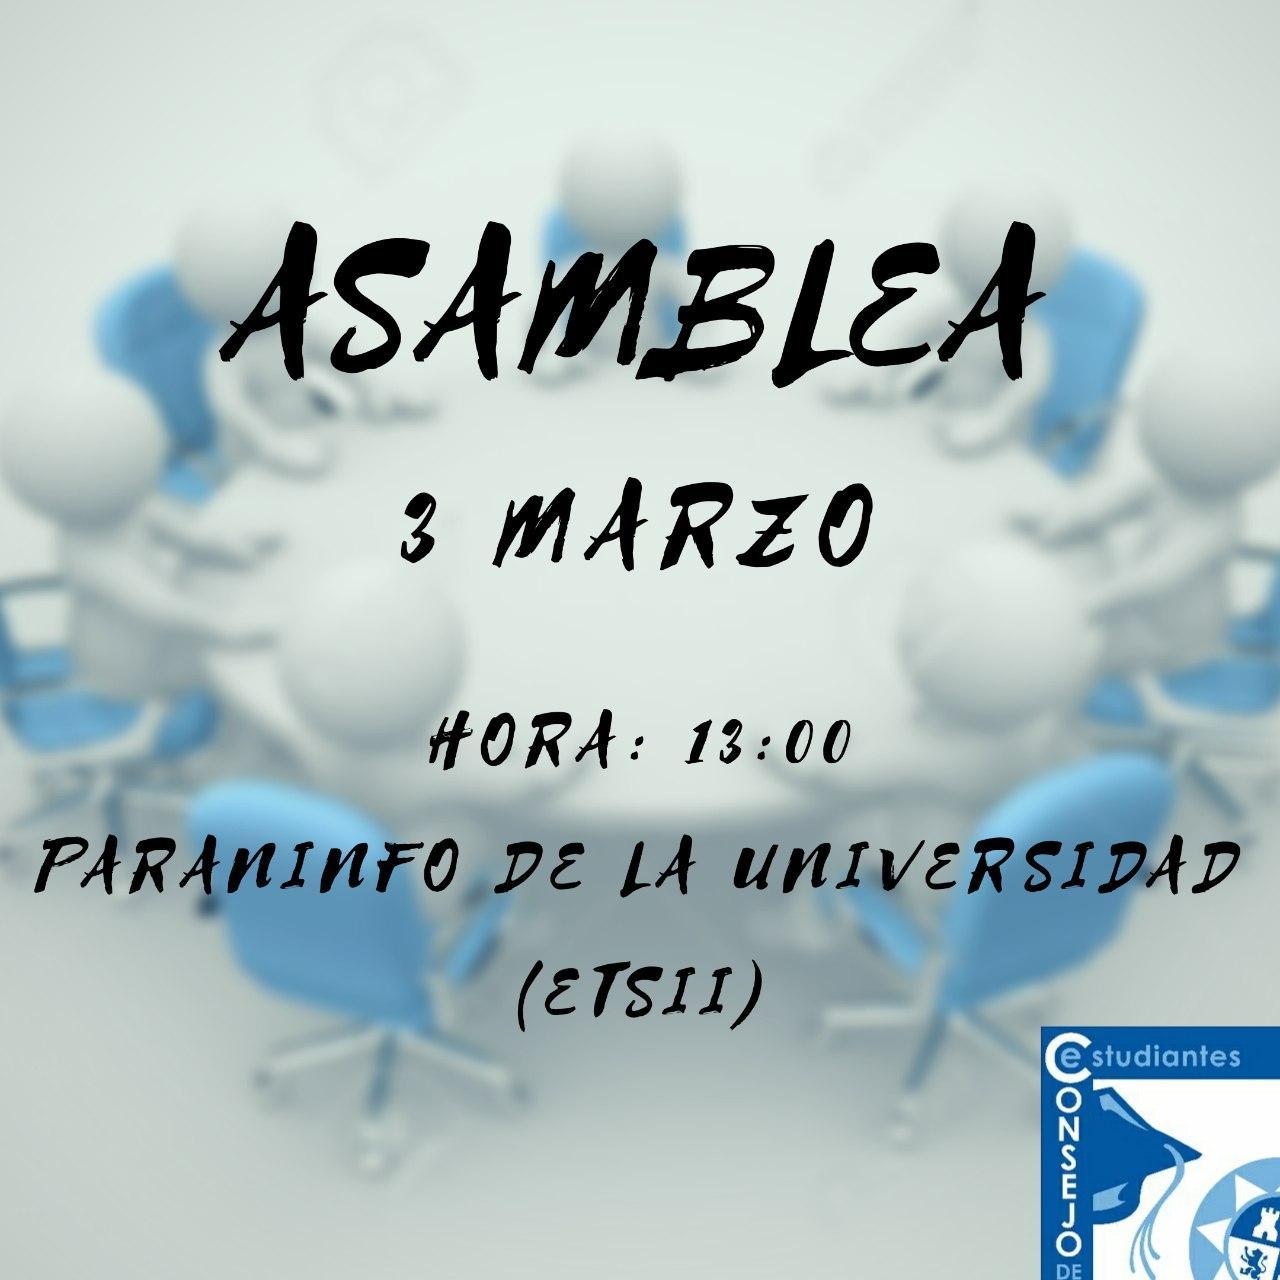 Imagen_destaca_asamblea